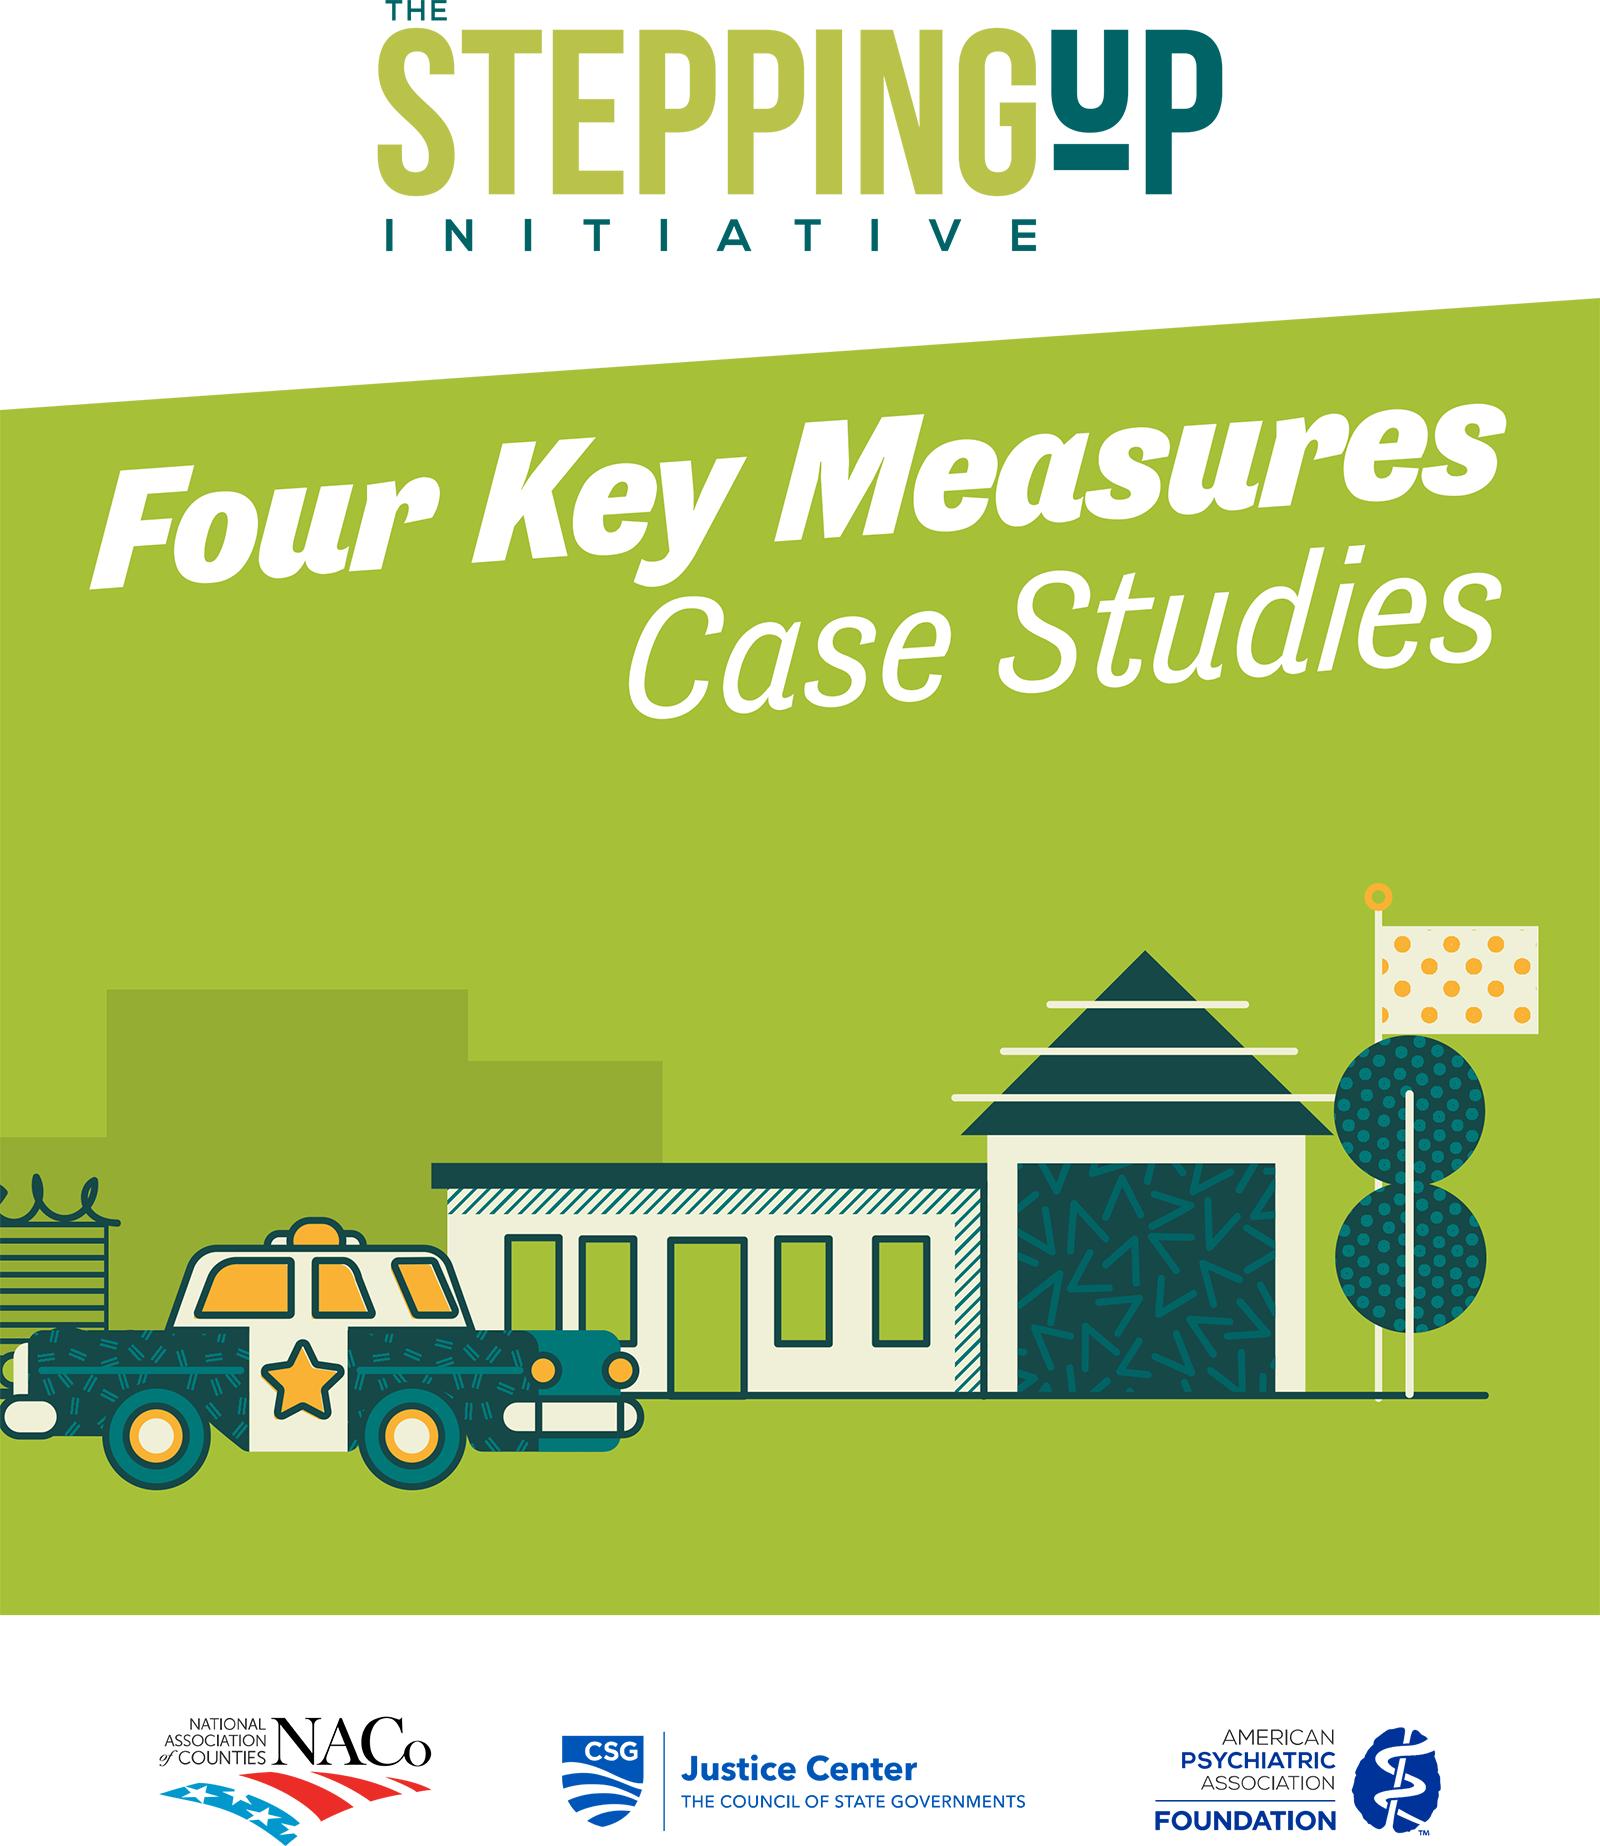 Stepping Up Four Key Measures Case Studies | NACo